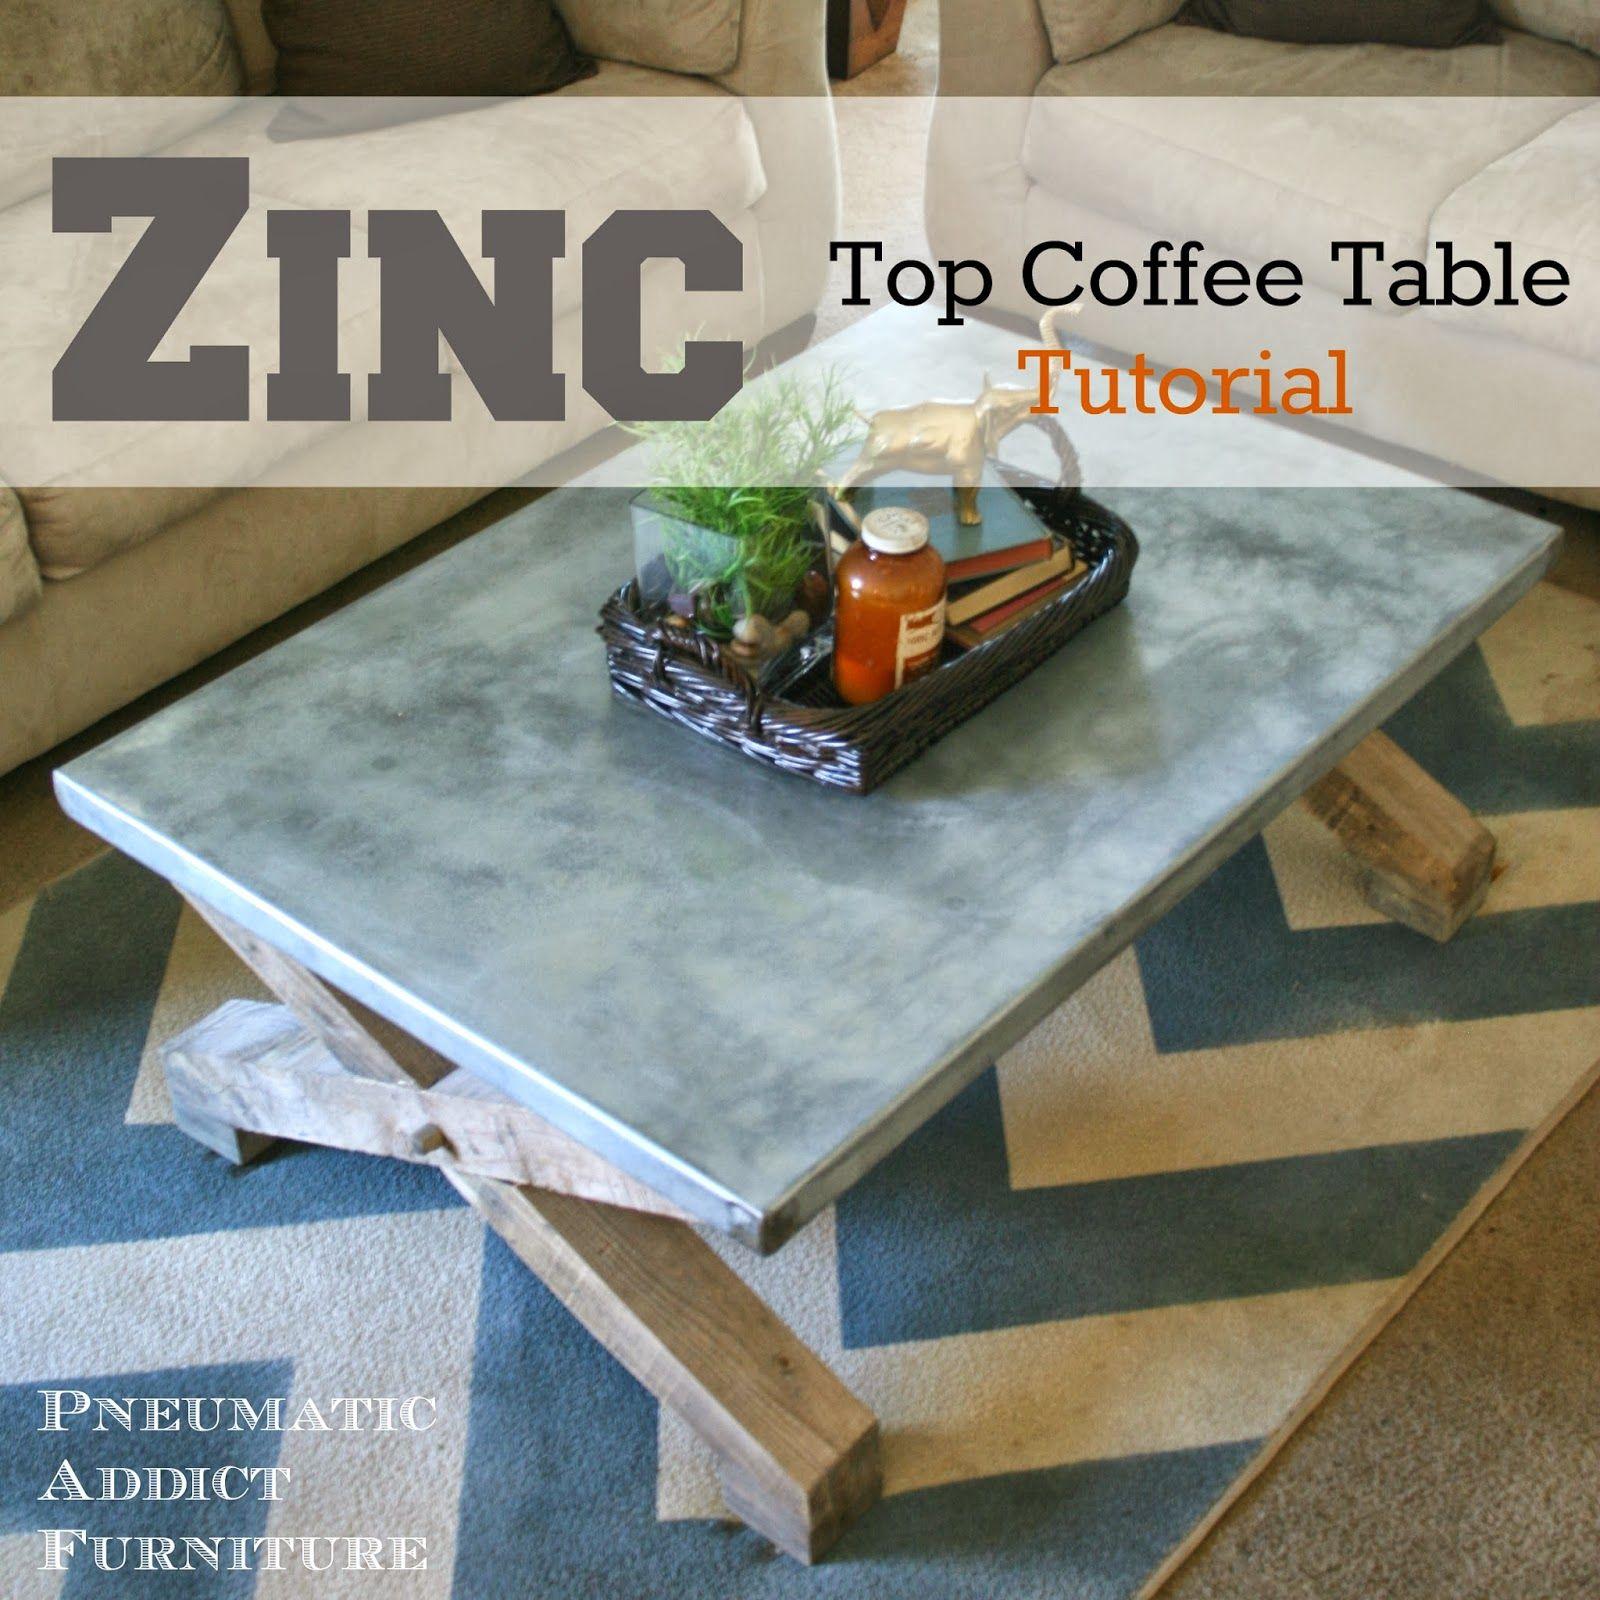 Zinc Top Coffee Table